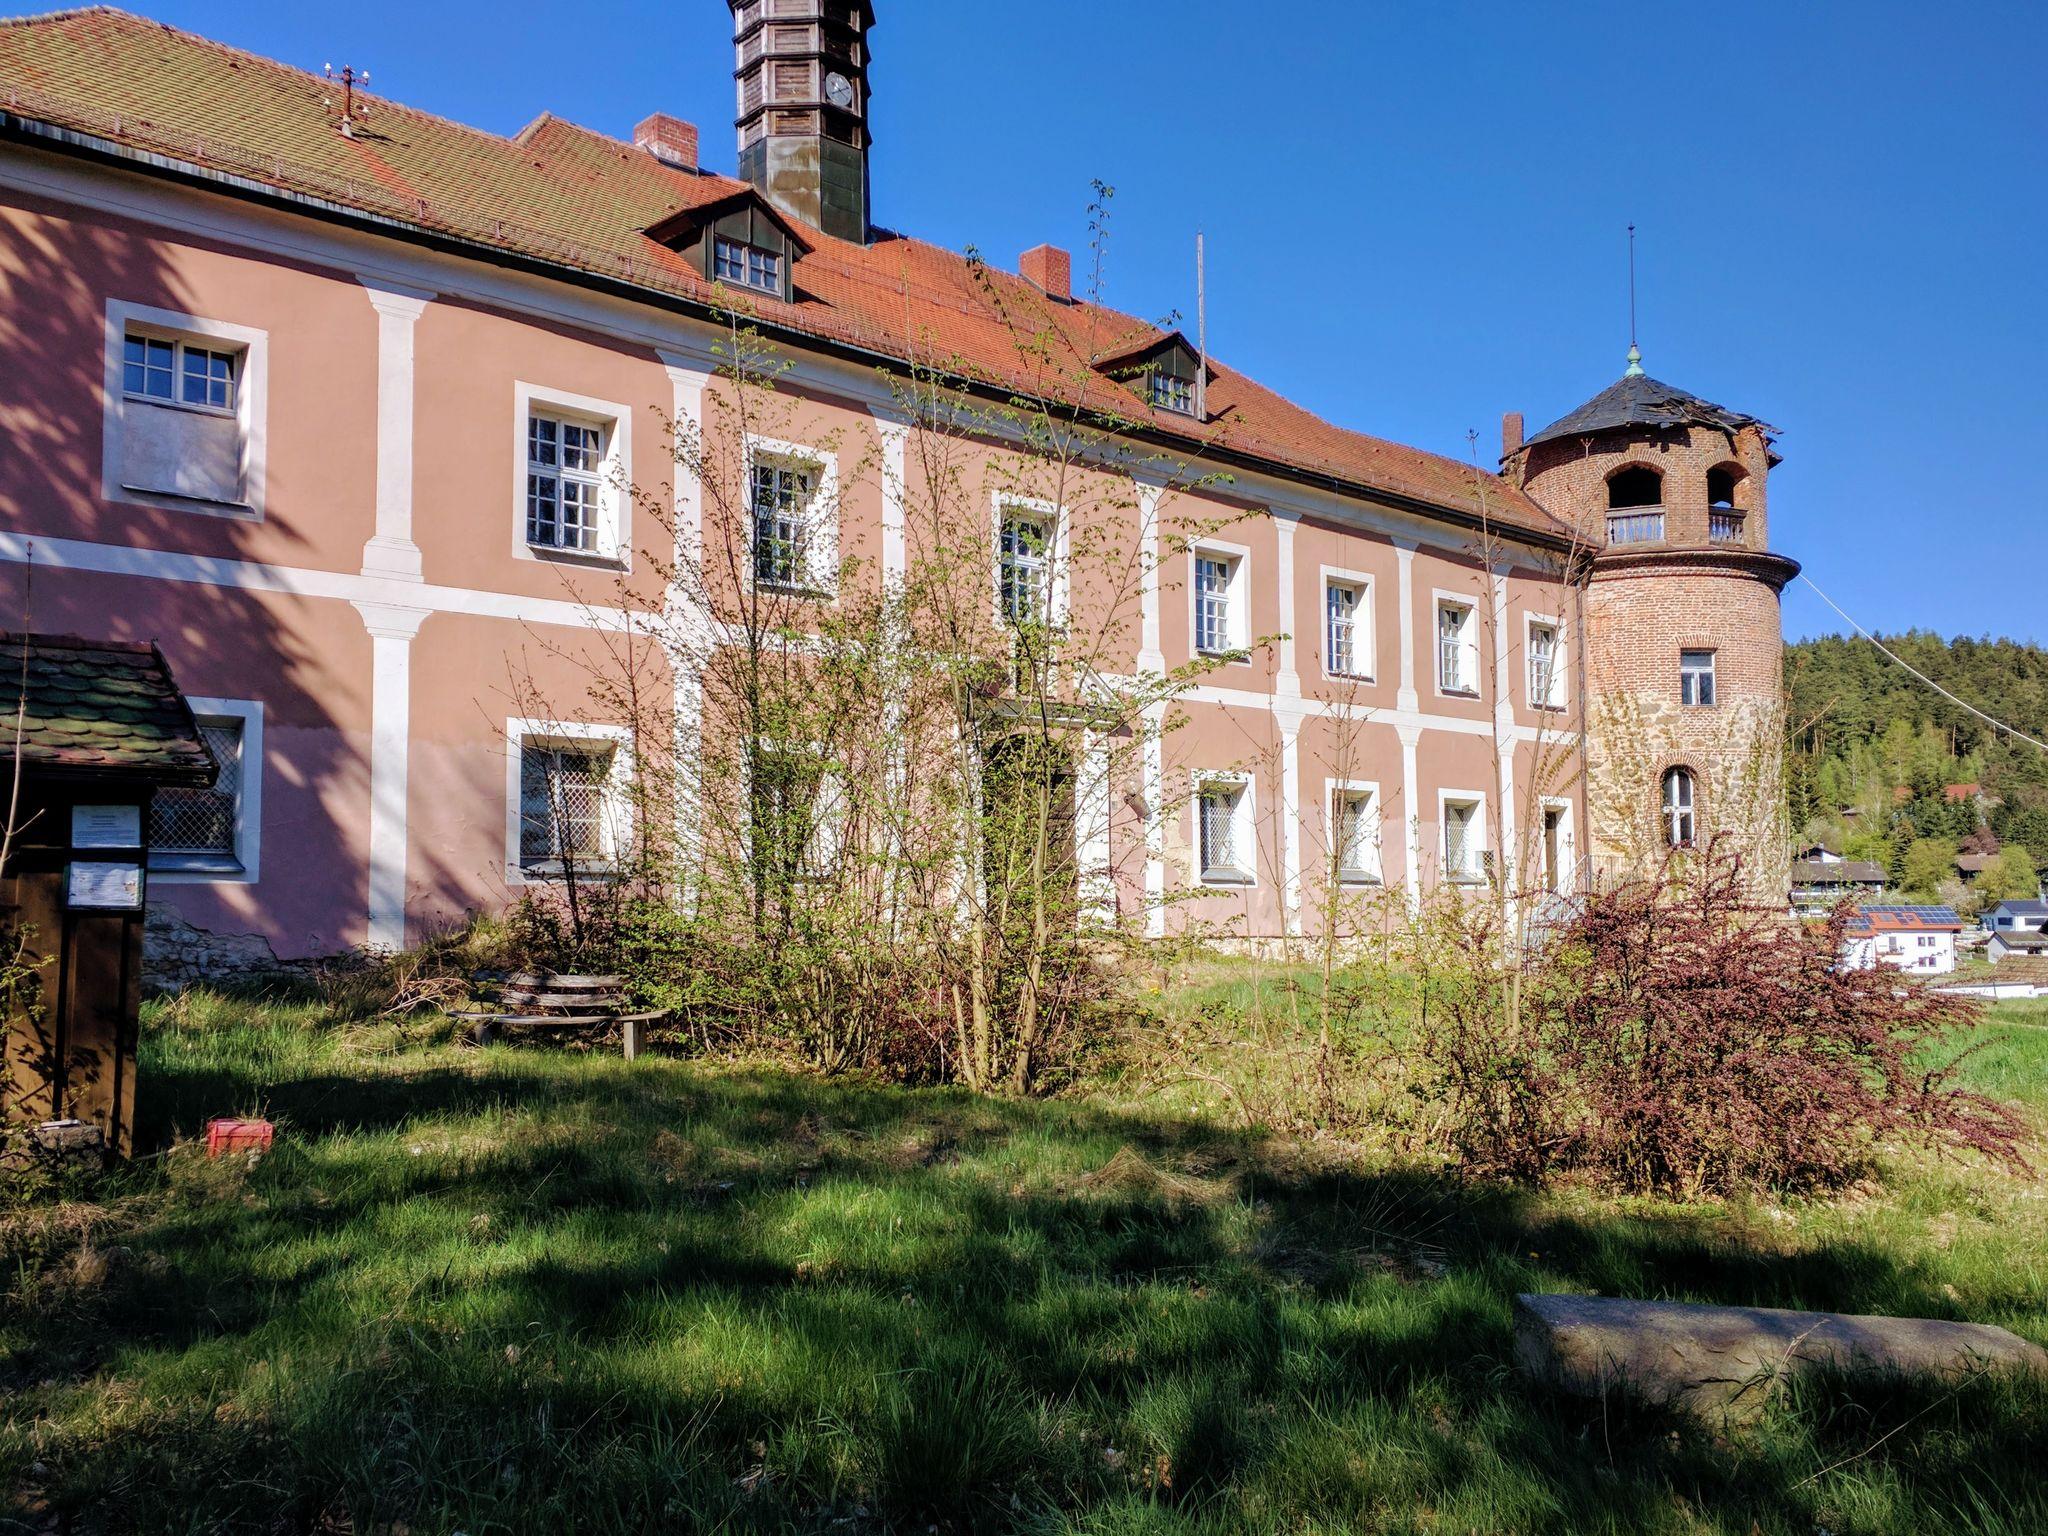 Verfallendes Schloss in Stamsried